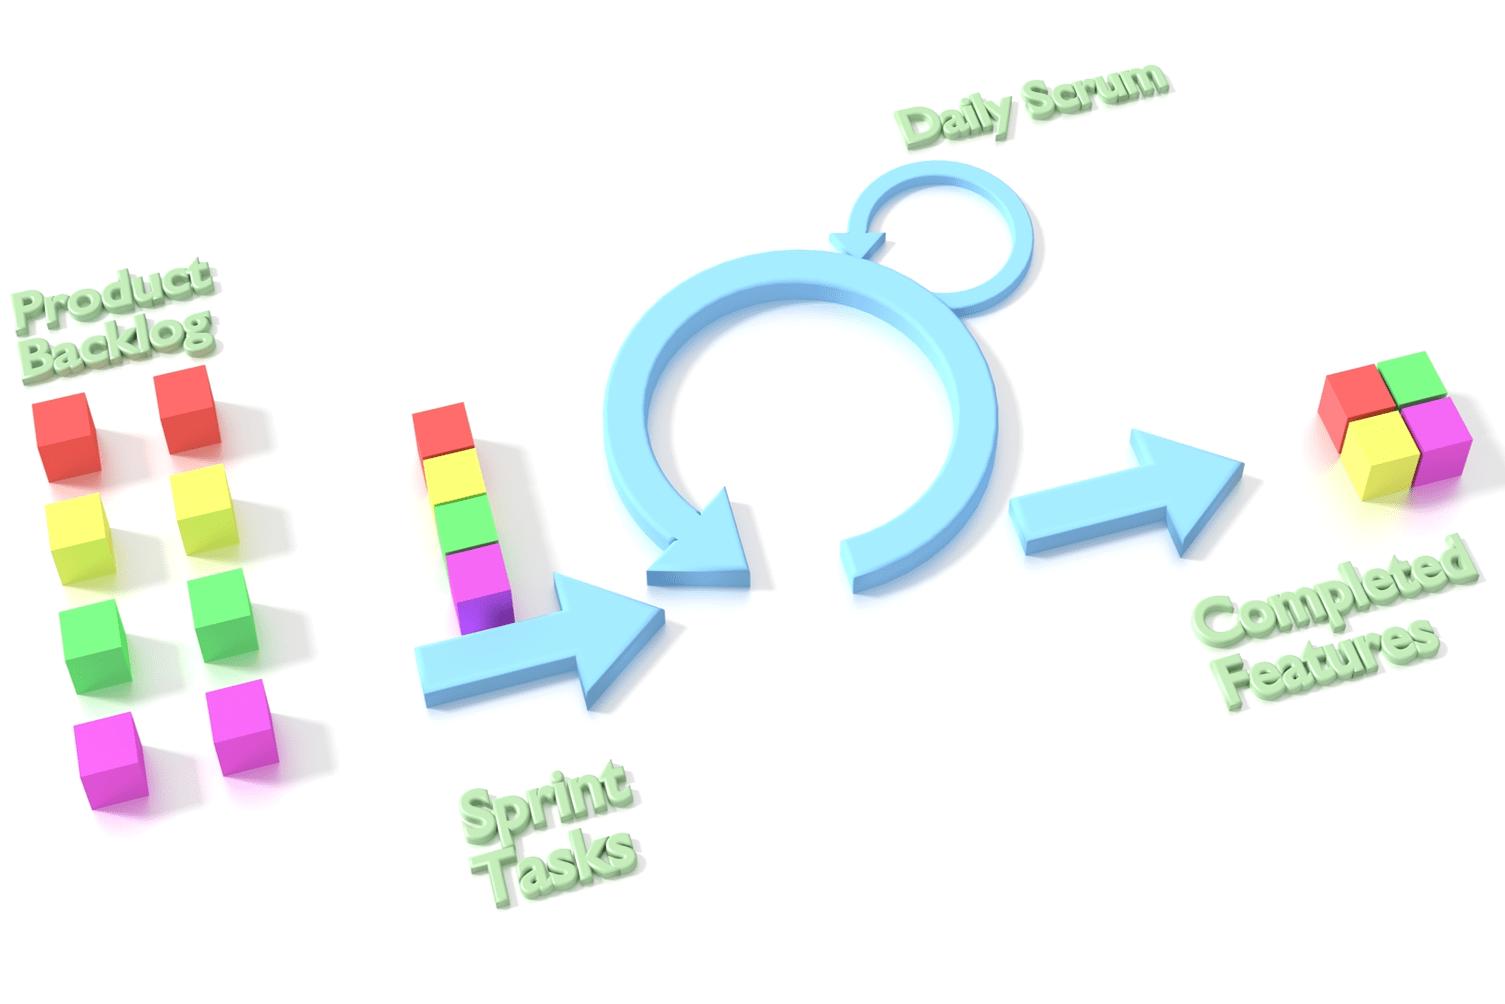 EDAP-Ciclo Scrum INICIO